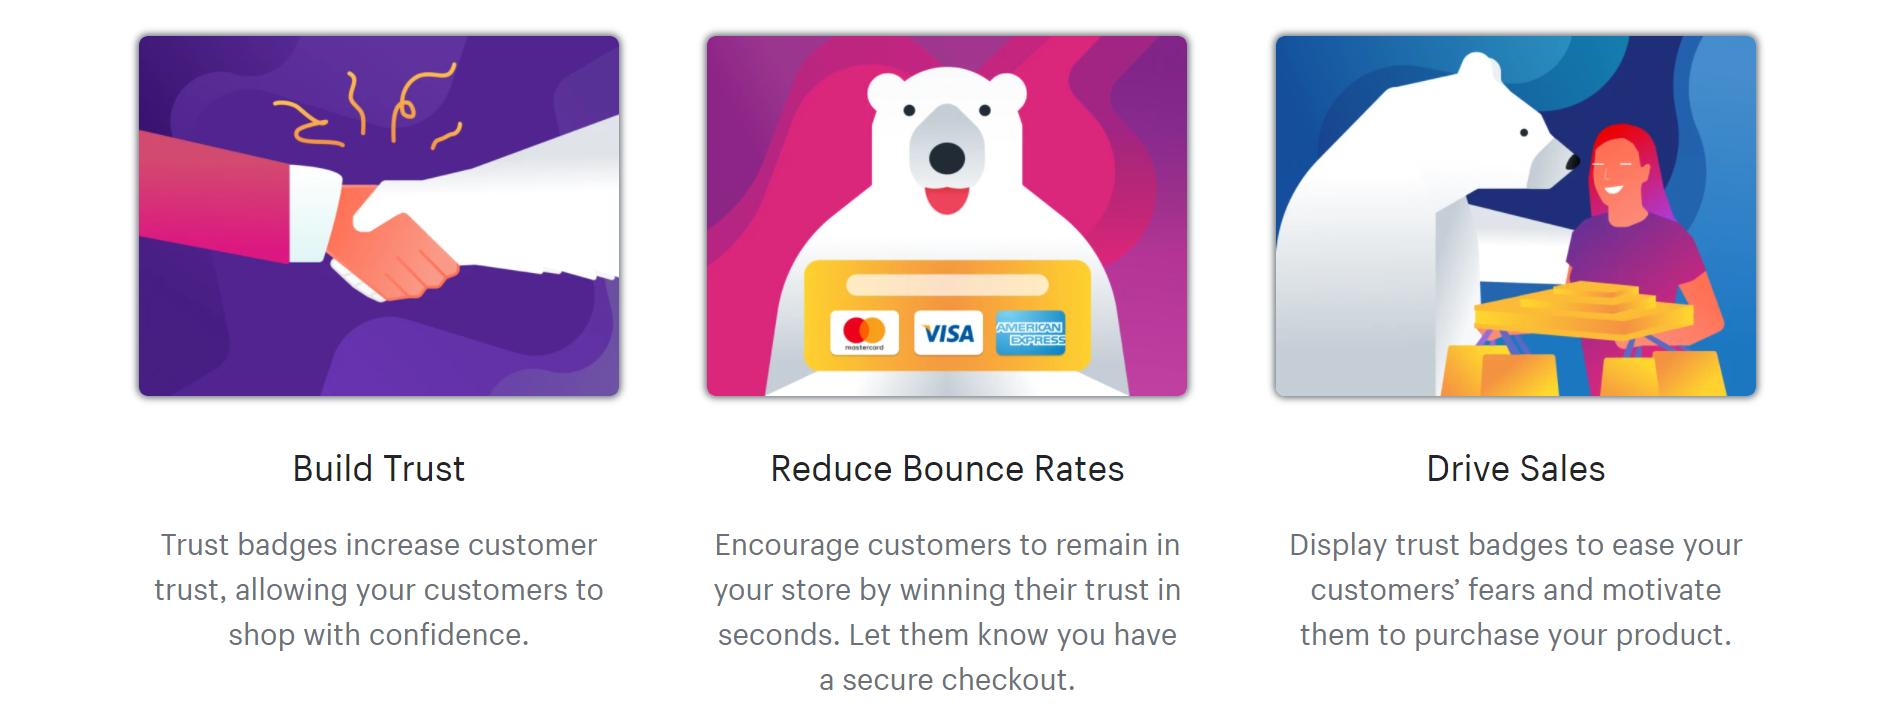 Ultimate Trust Badges 应用登陆页面